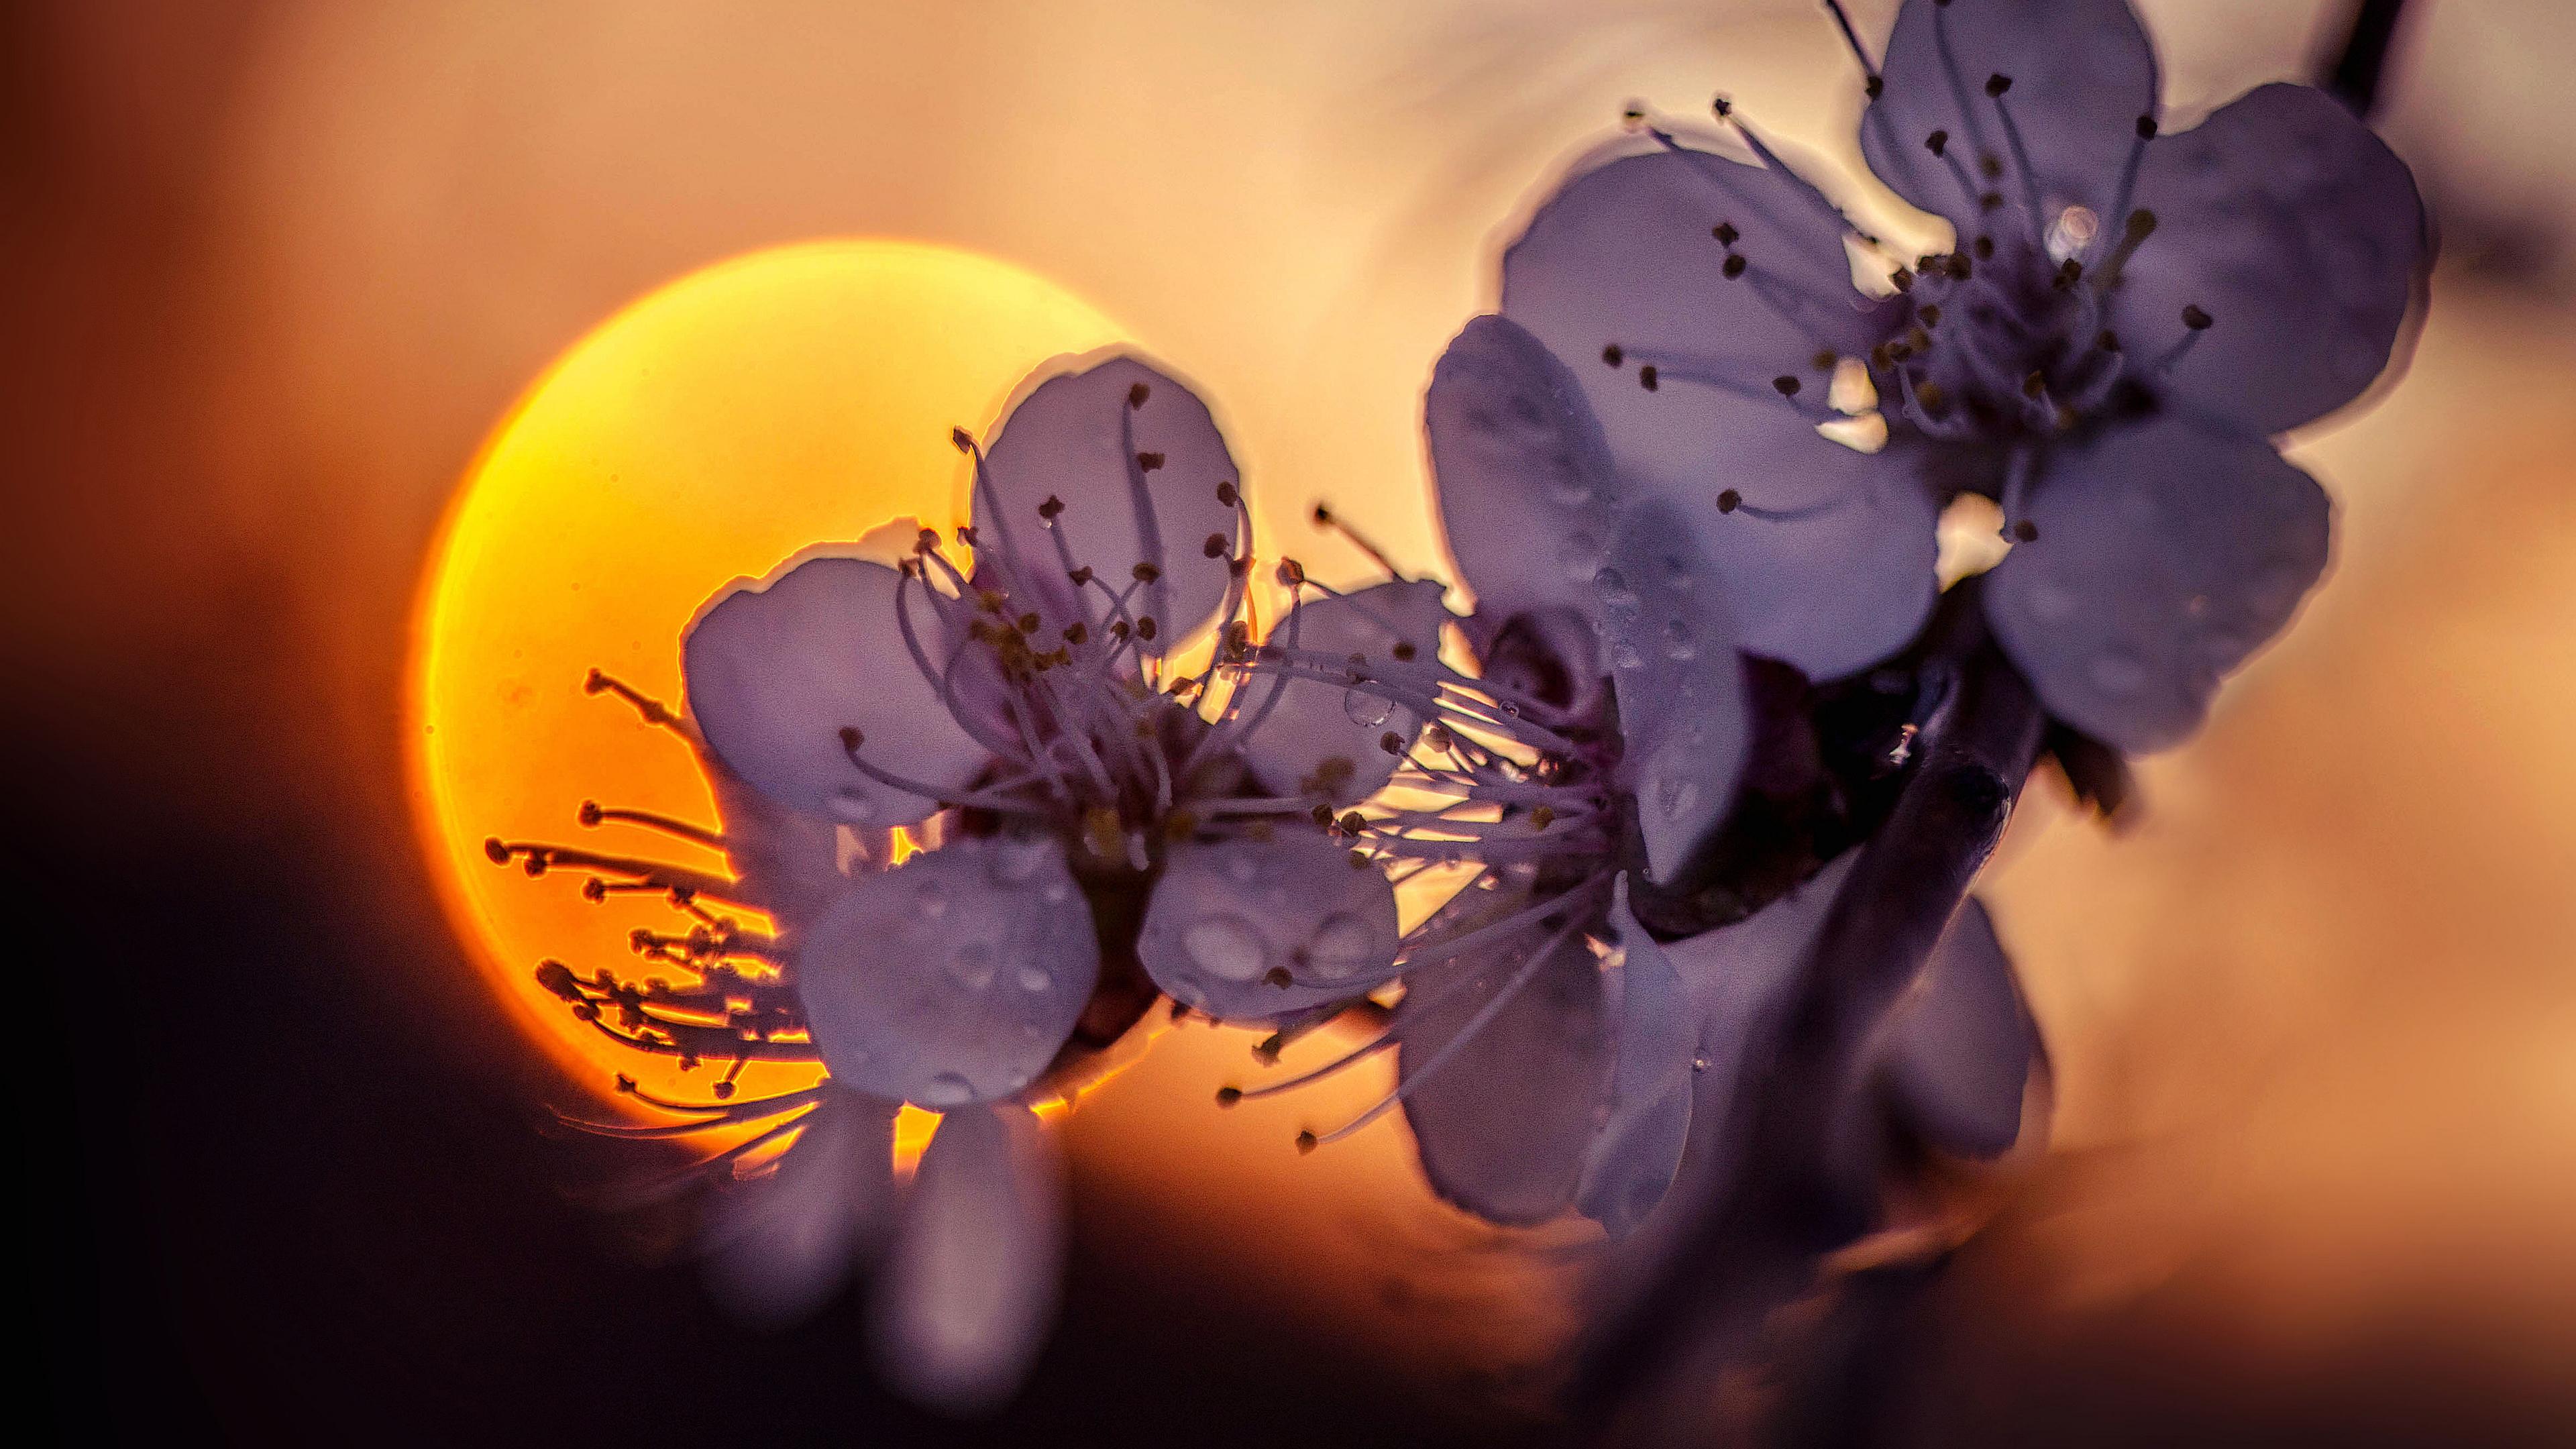 Ветка цветущей яблони на фоне шар-солнце